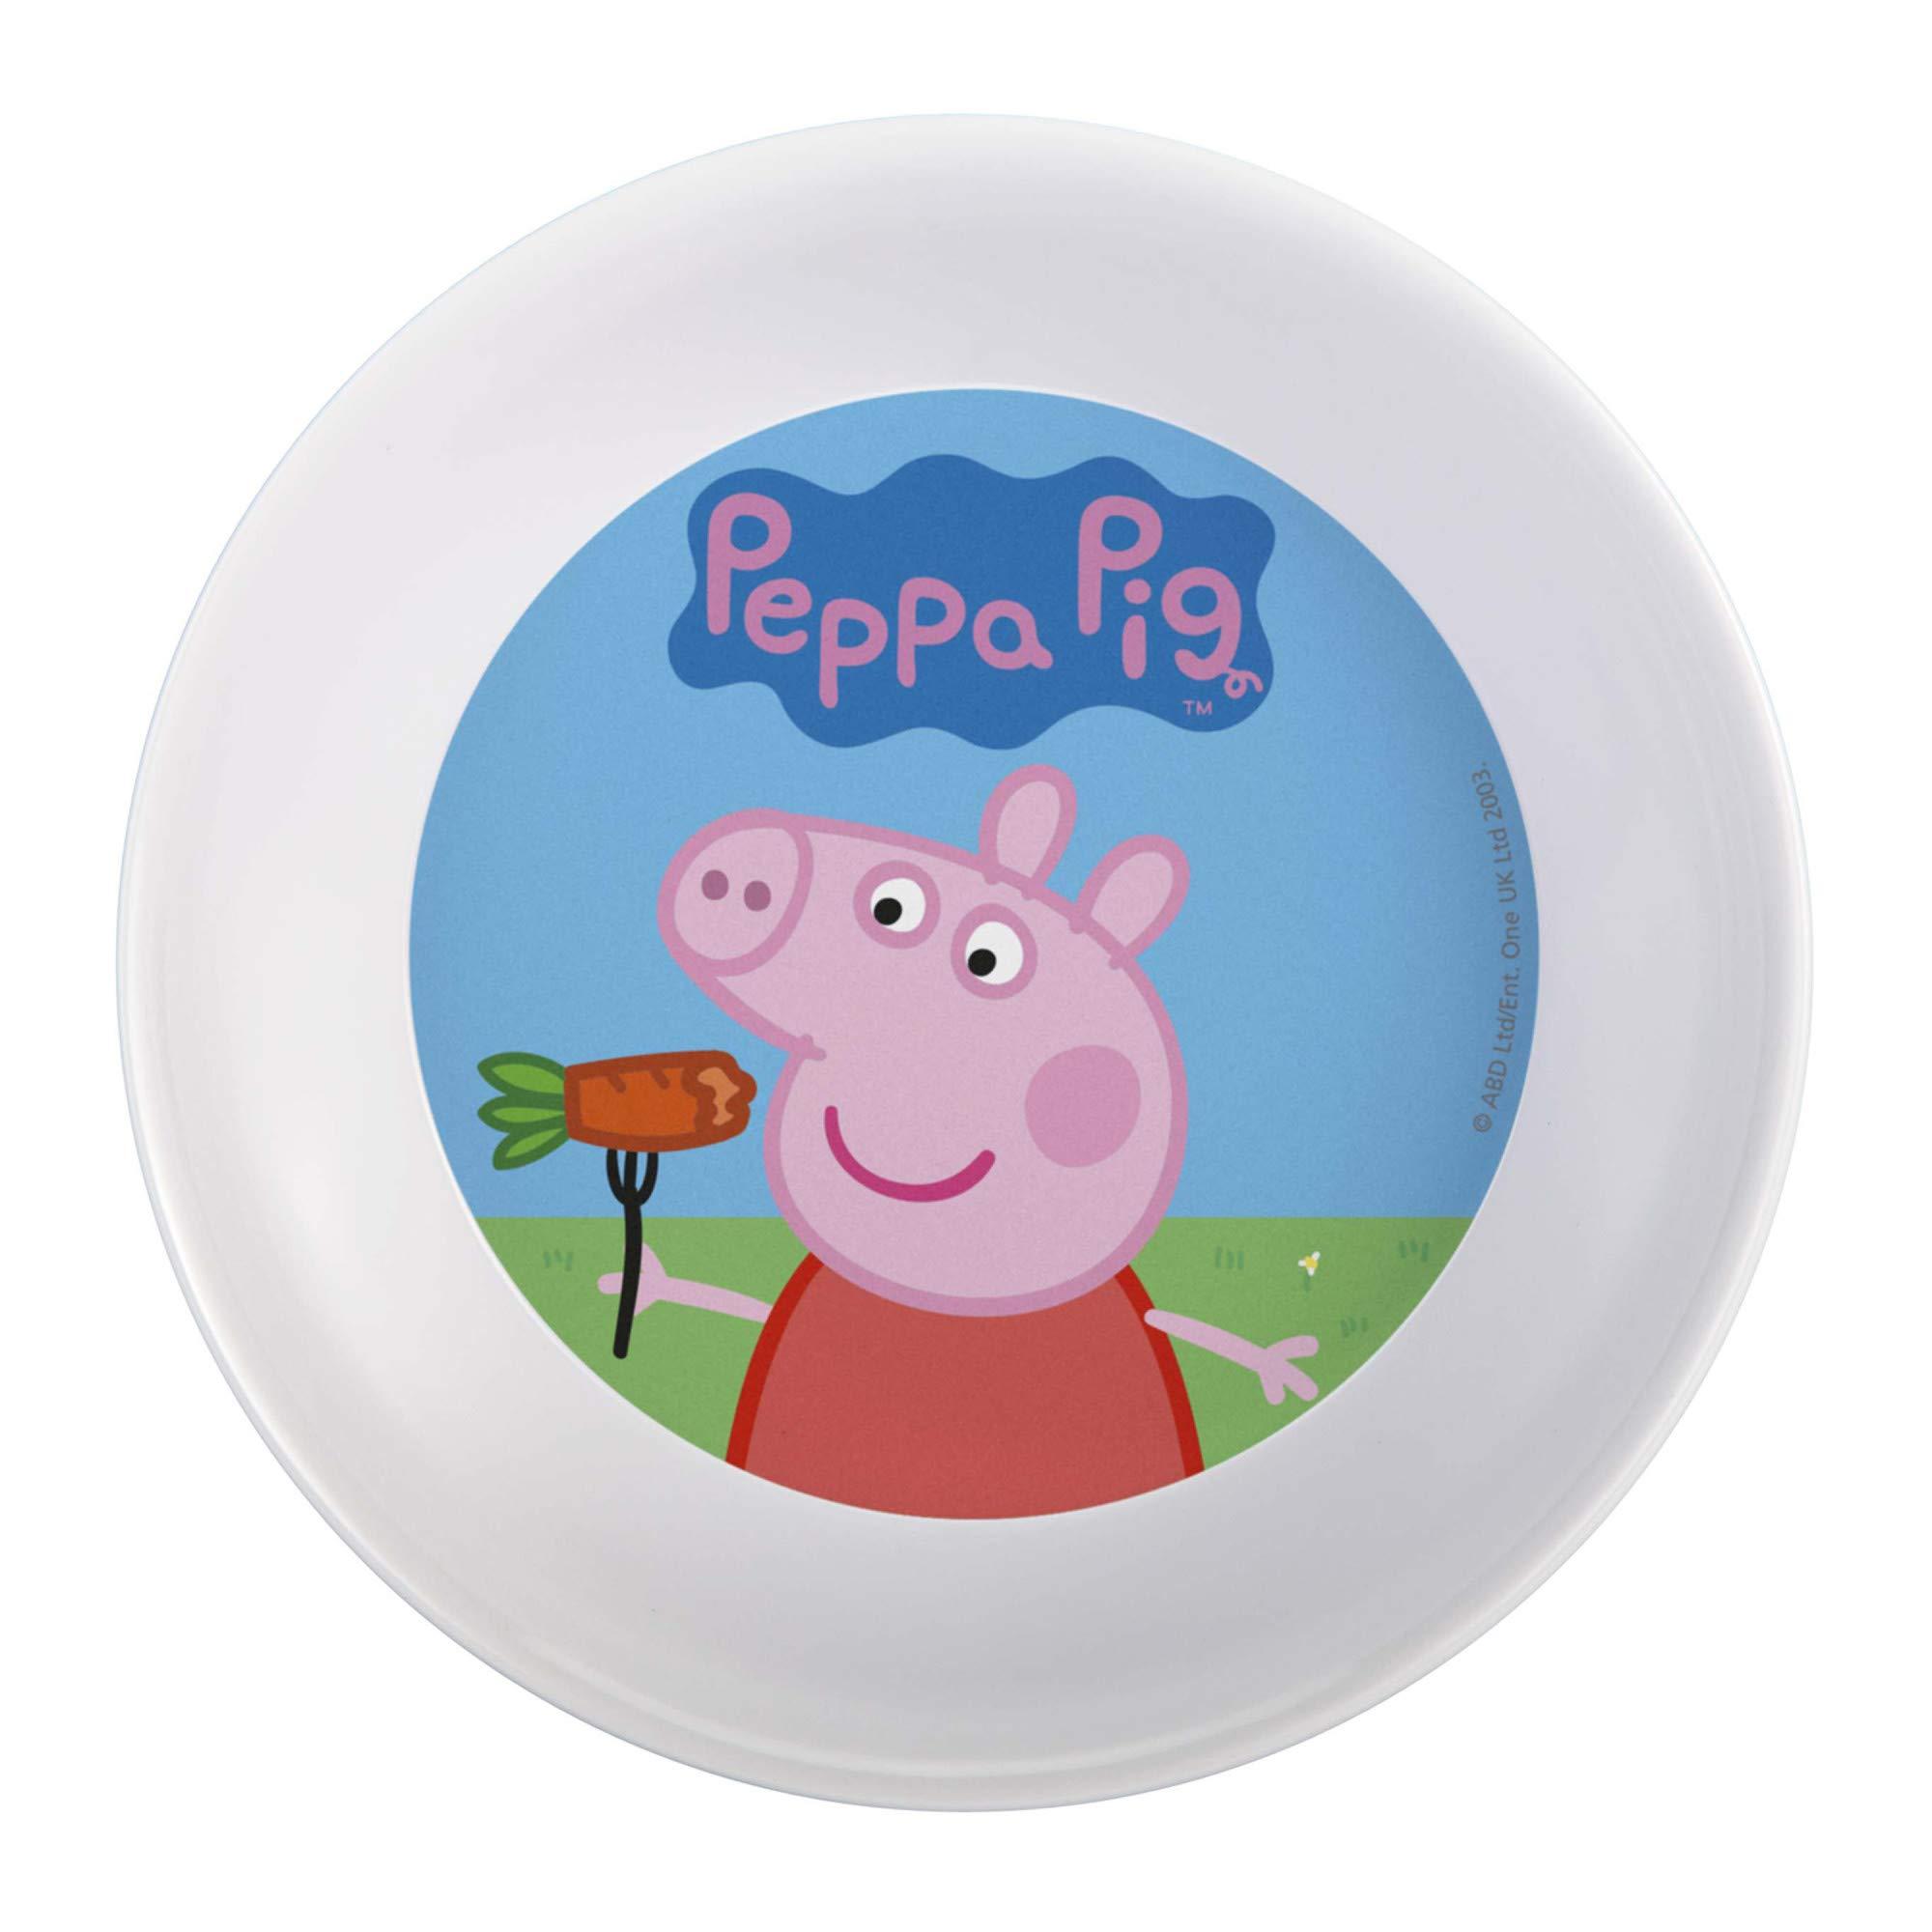 Nick Jr. PEPA-0391 Peppa Pig Melamine Plates 3-piece set by Zak Designs by Zak Designs (Image #2)